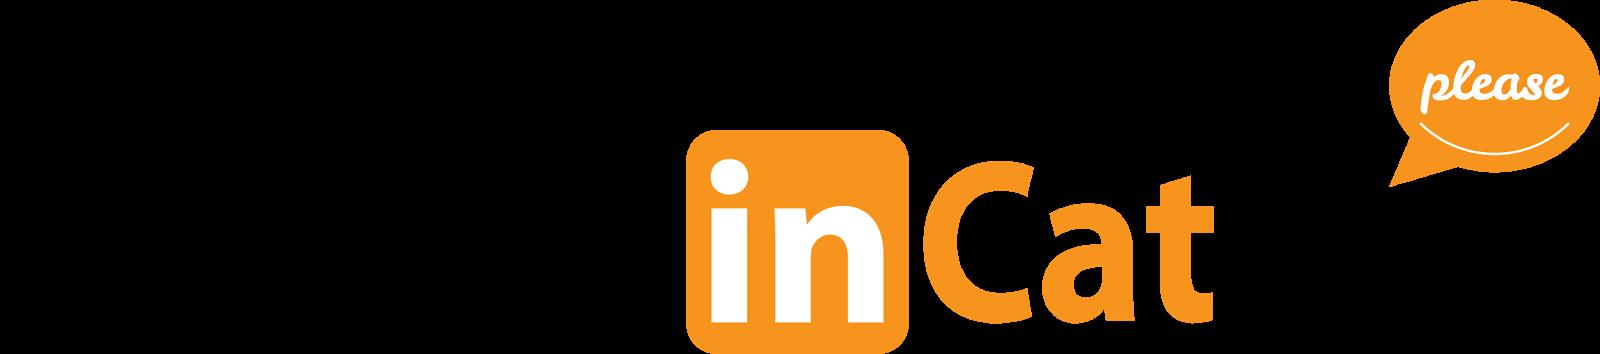 Linkedin en català